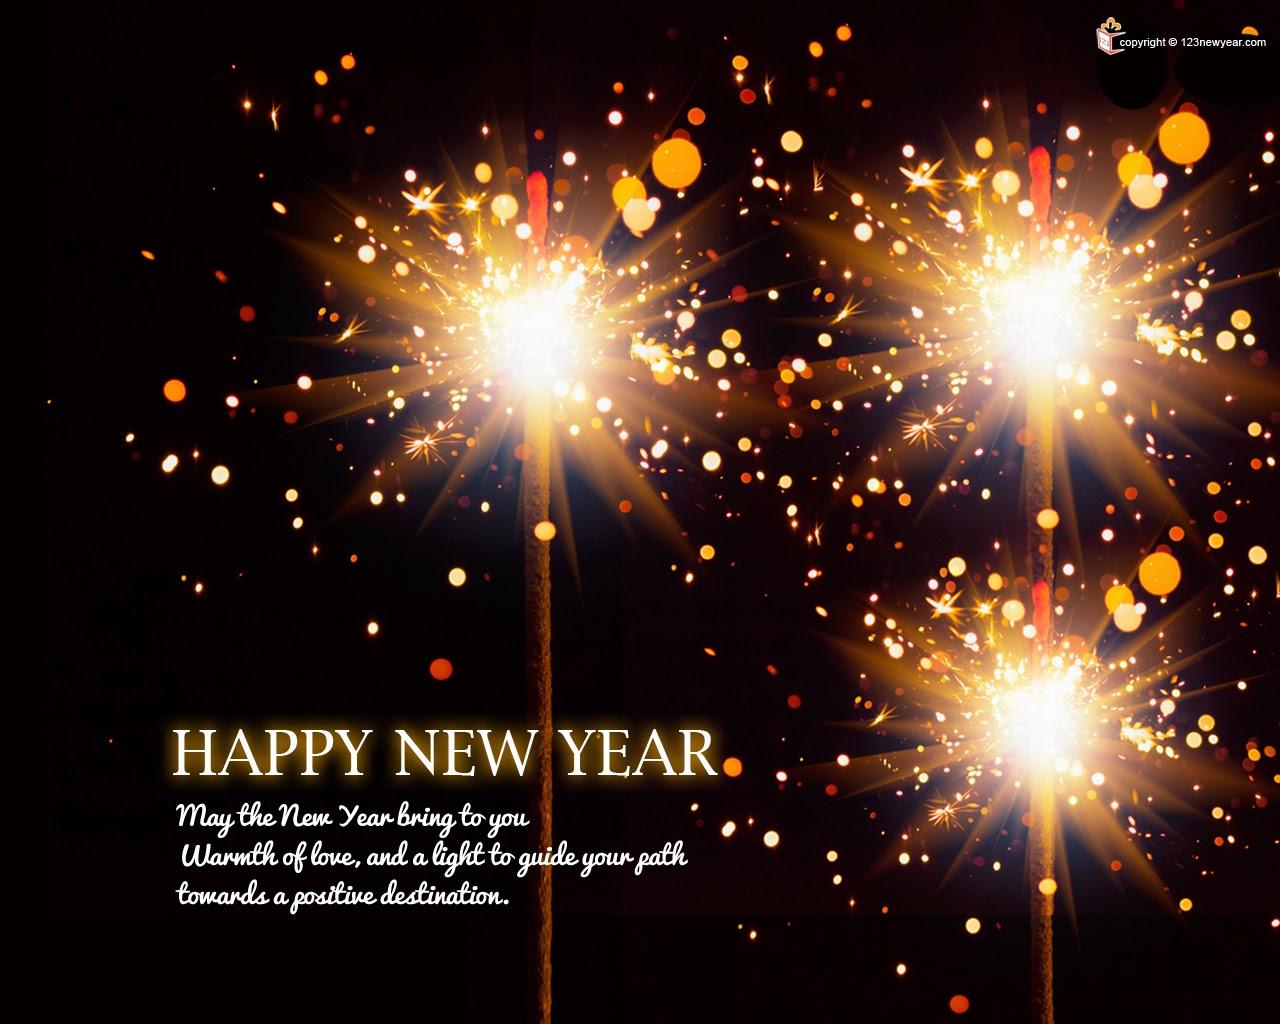 gambar+ucapan+tahun+baru+2014+keren.jpg